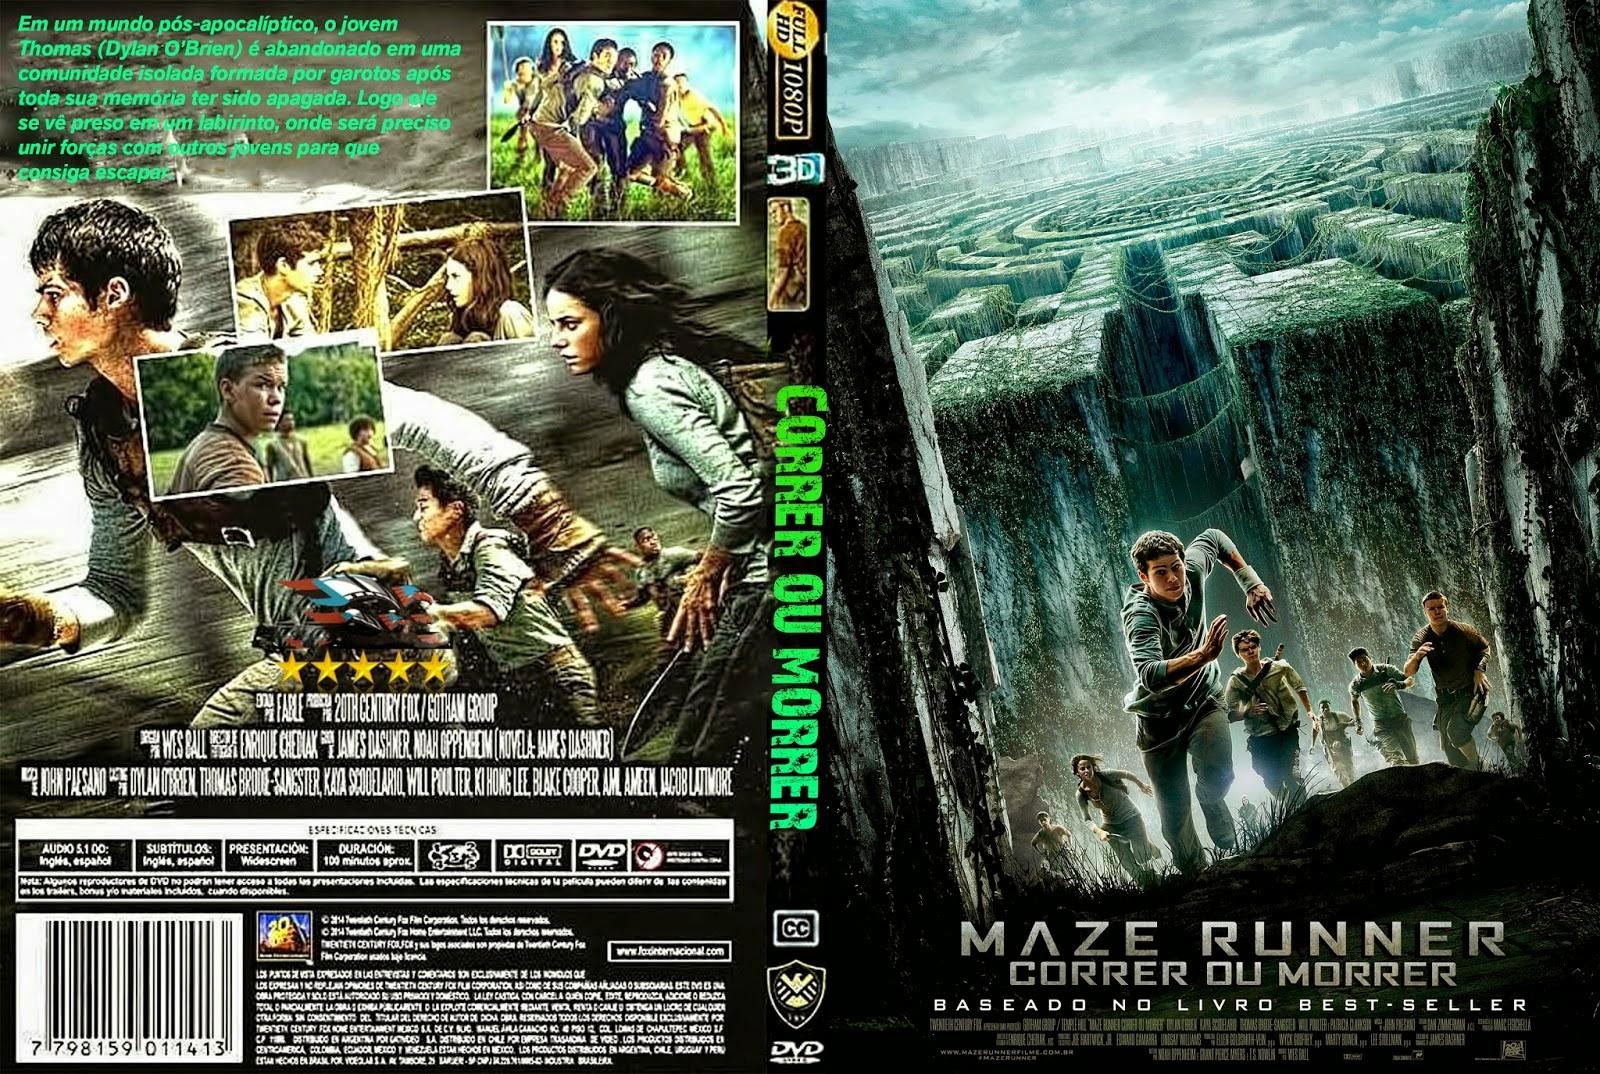 Maze runner correr ou morrer dvd capa